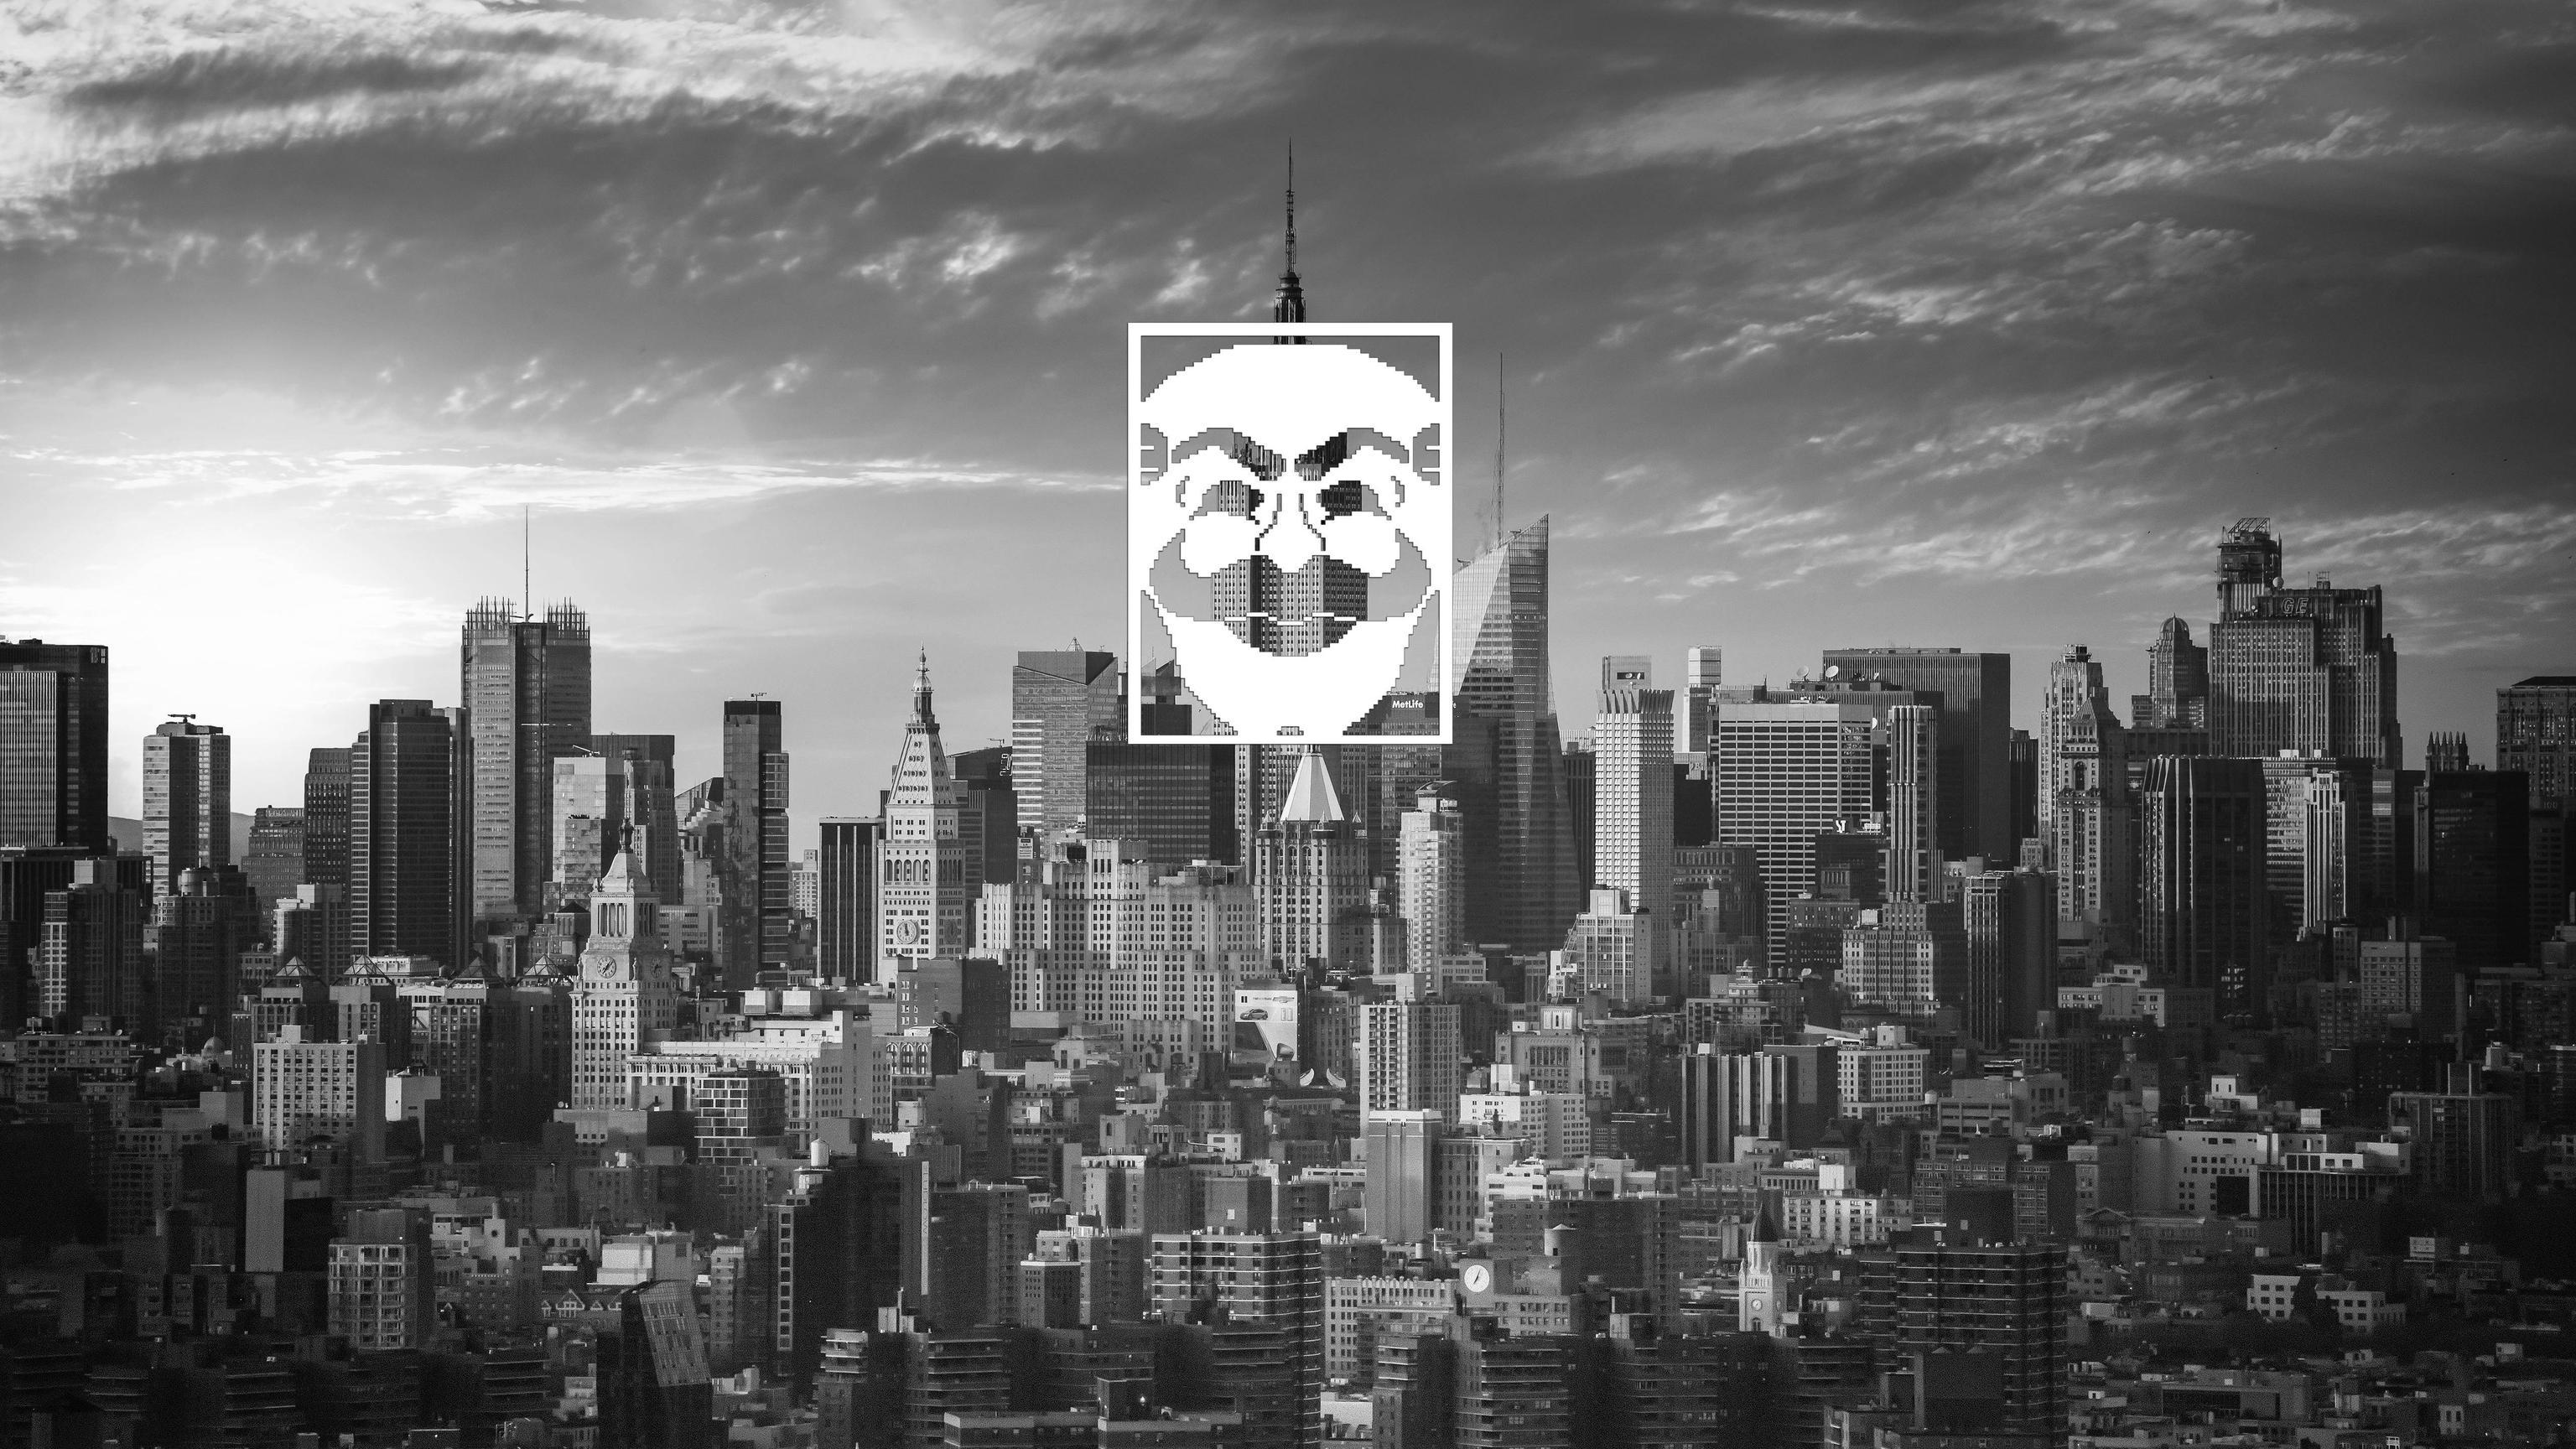 mr robot logo, hd tv shows, 4k wallpapers, images, backgrounds